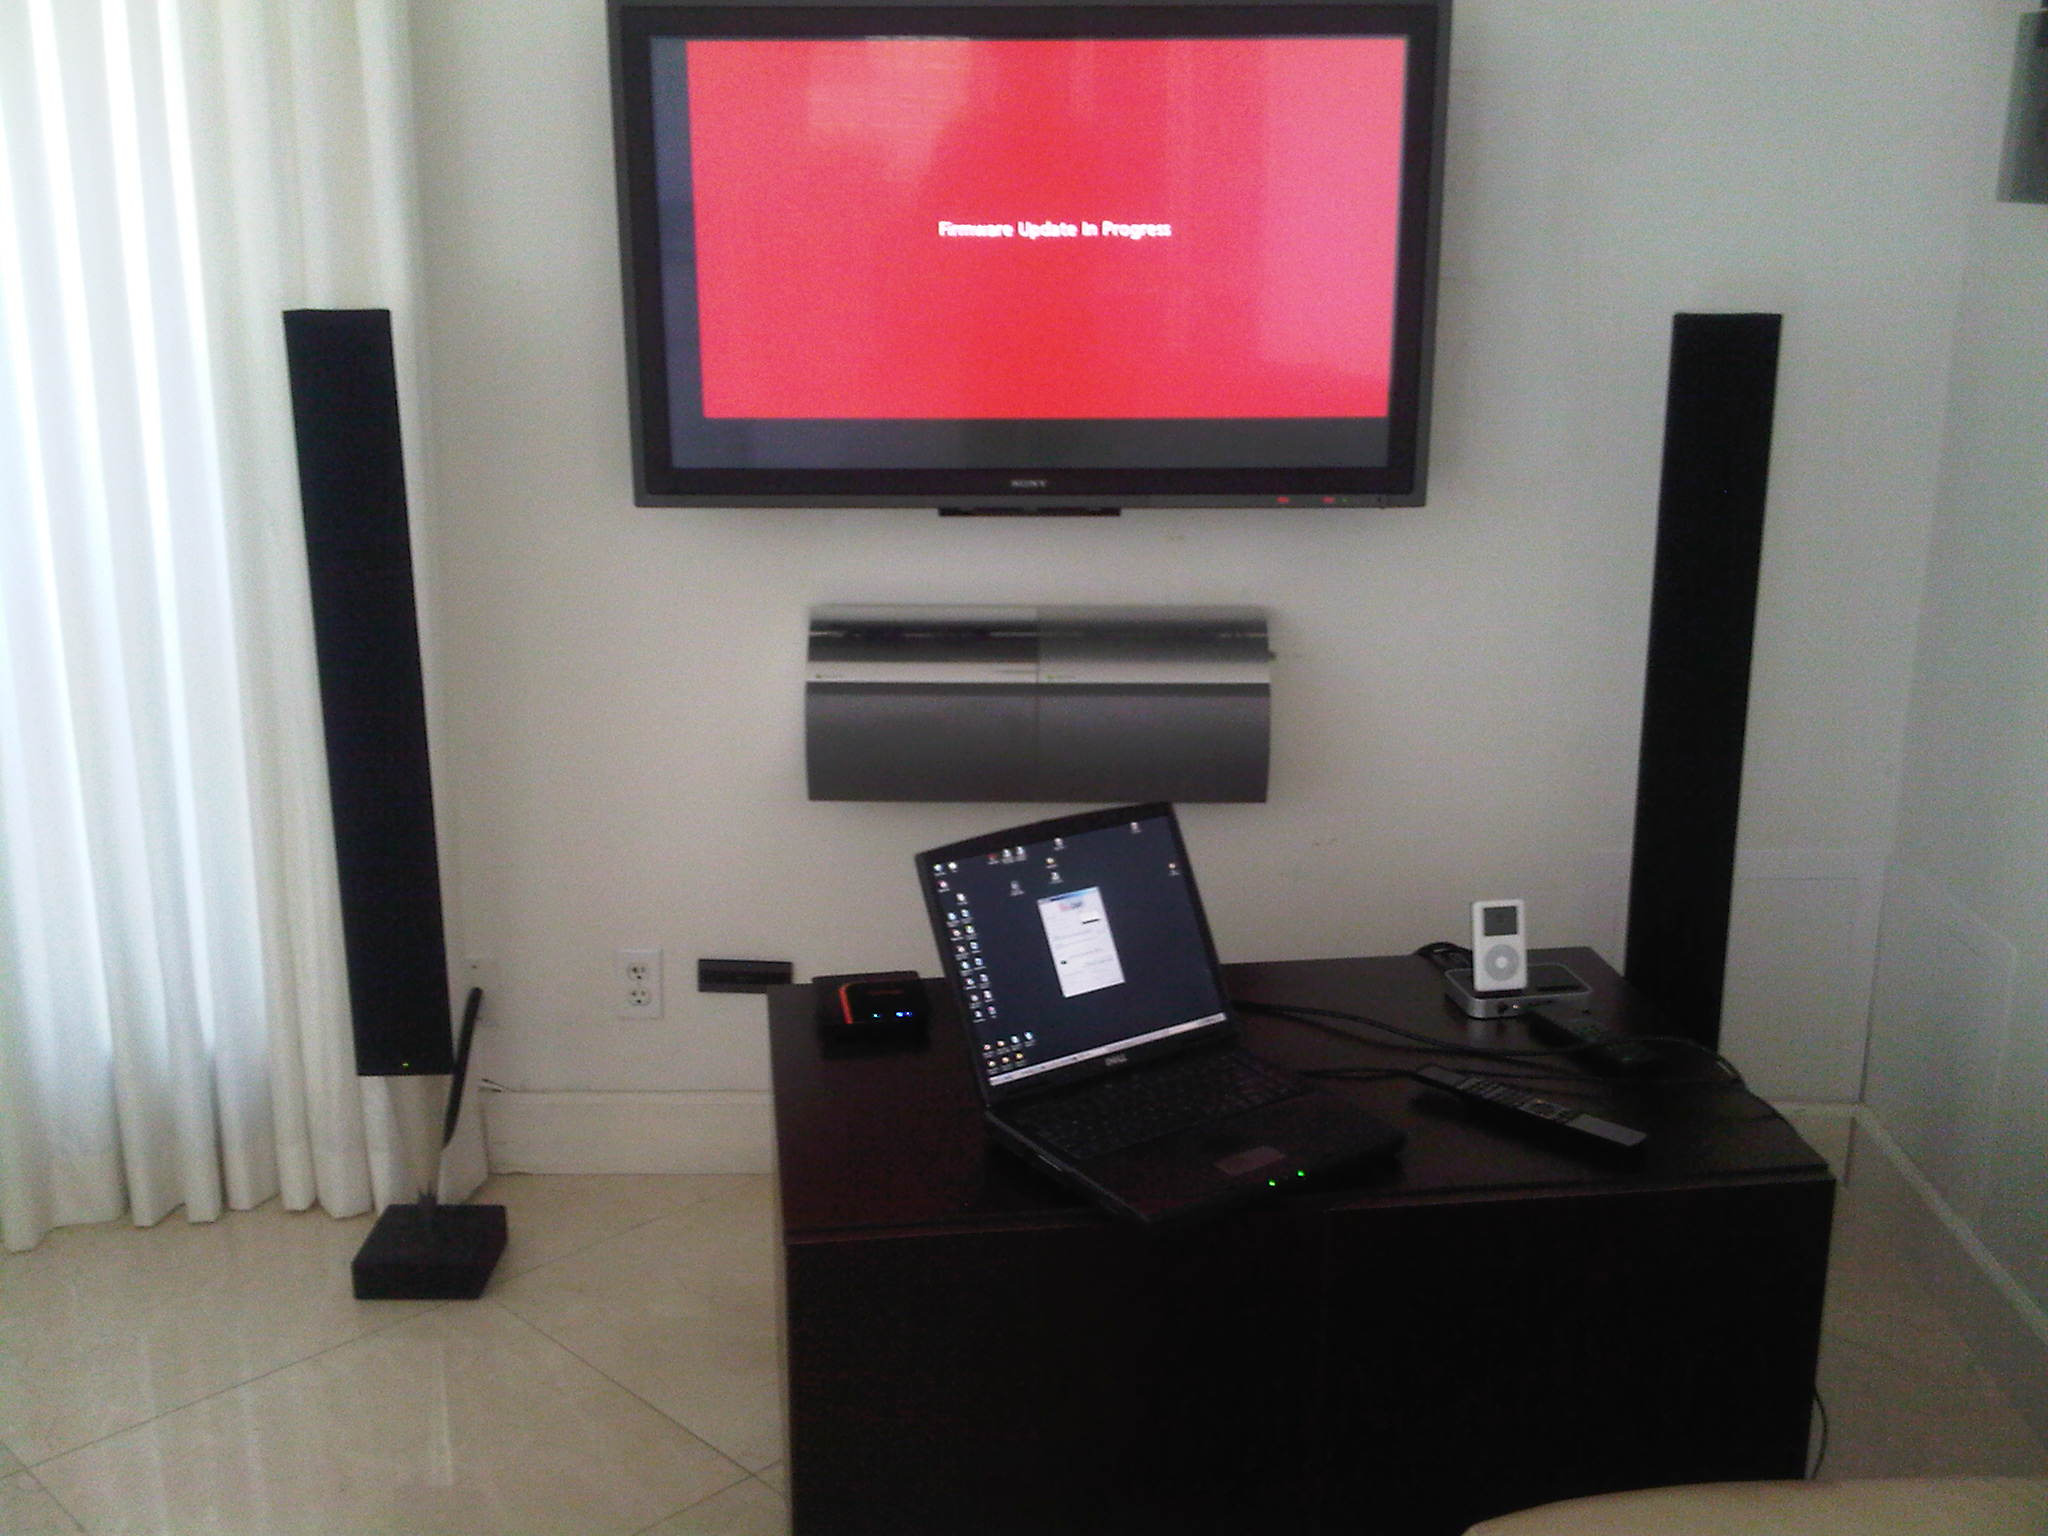 Premium Audio Visual installation by dmg Martinez Group in Miami